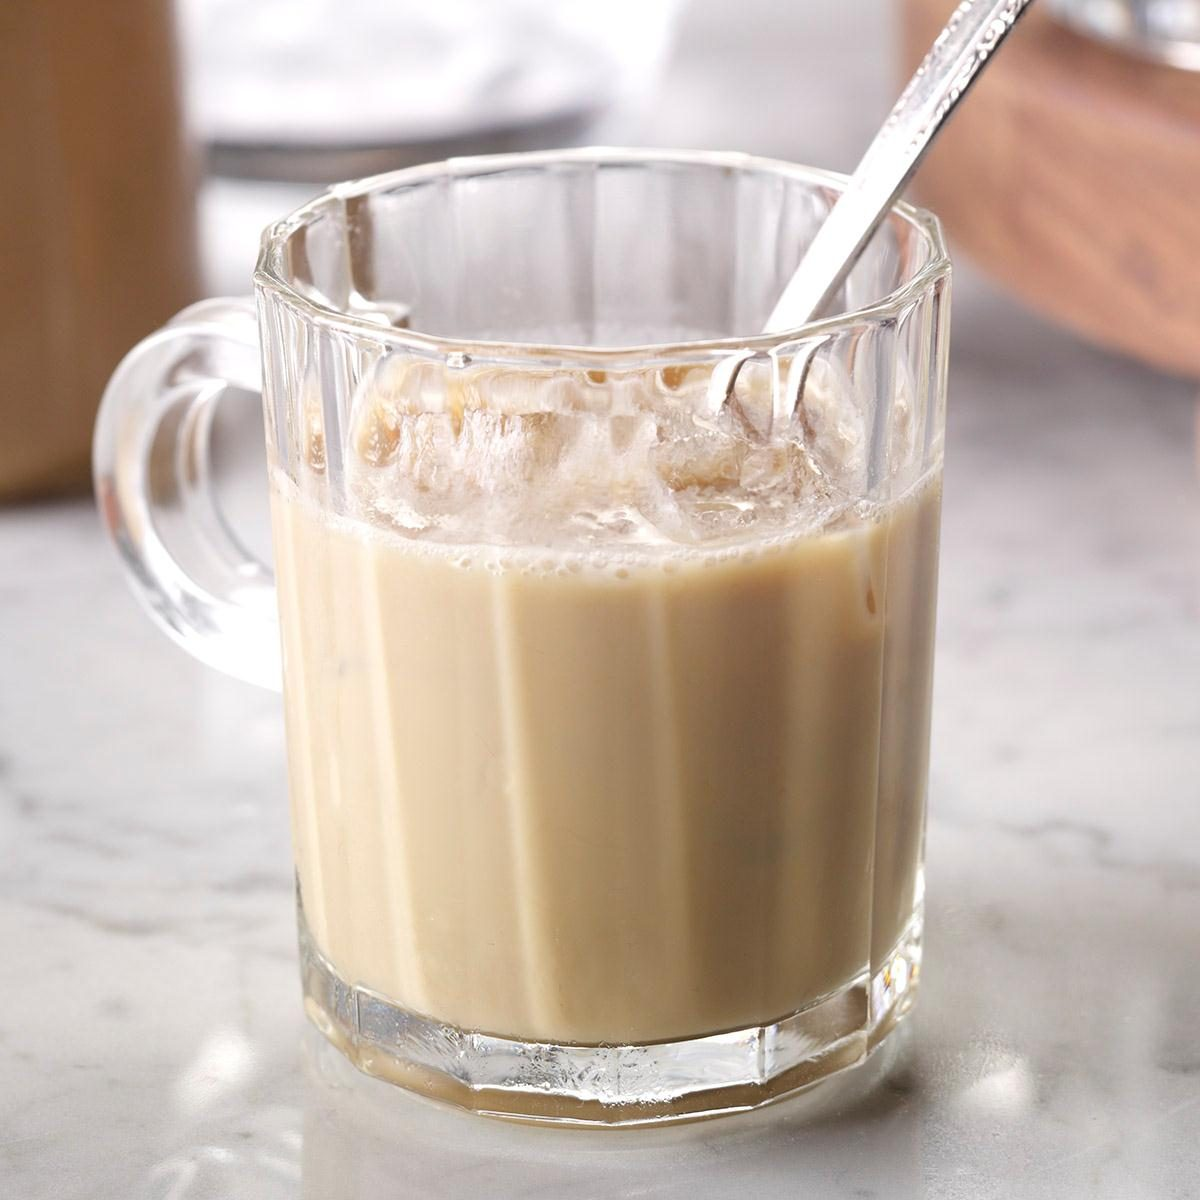 Simple Iced Coffee Recipe | Taste of Home